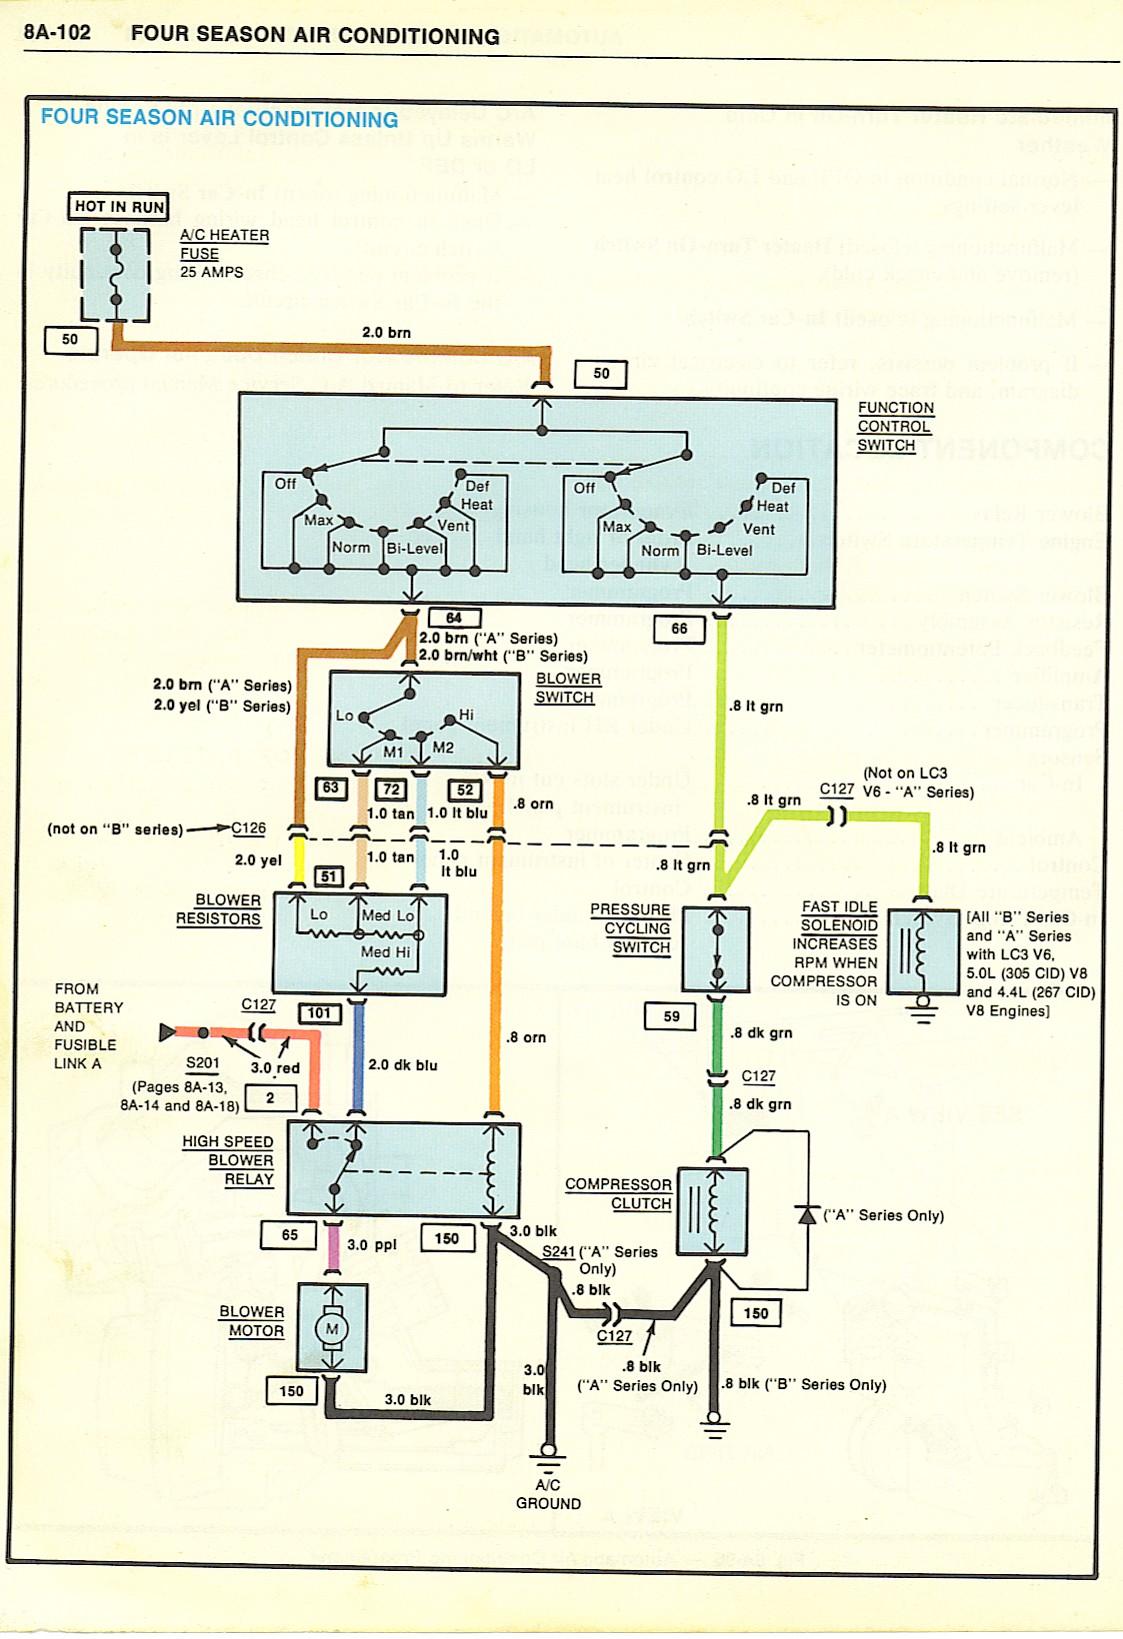 Peachy T300 Wiring Diagram Wiring Library Wiring Cloud Rineaidewilluminateatxorg